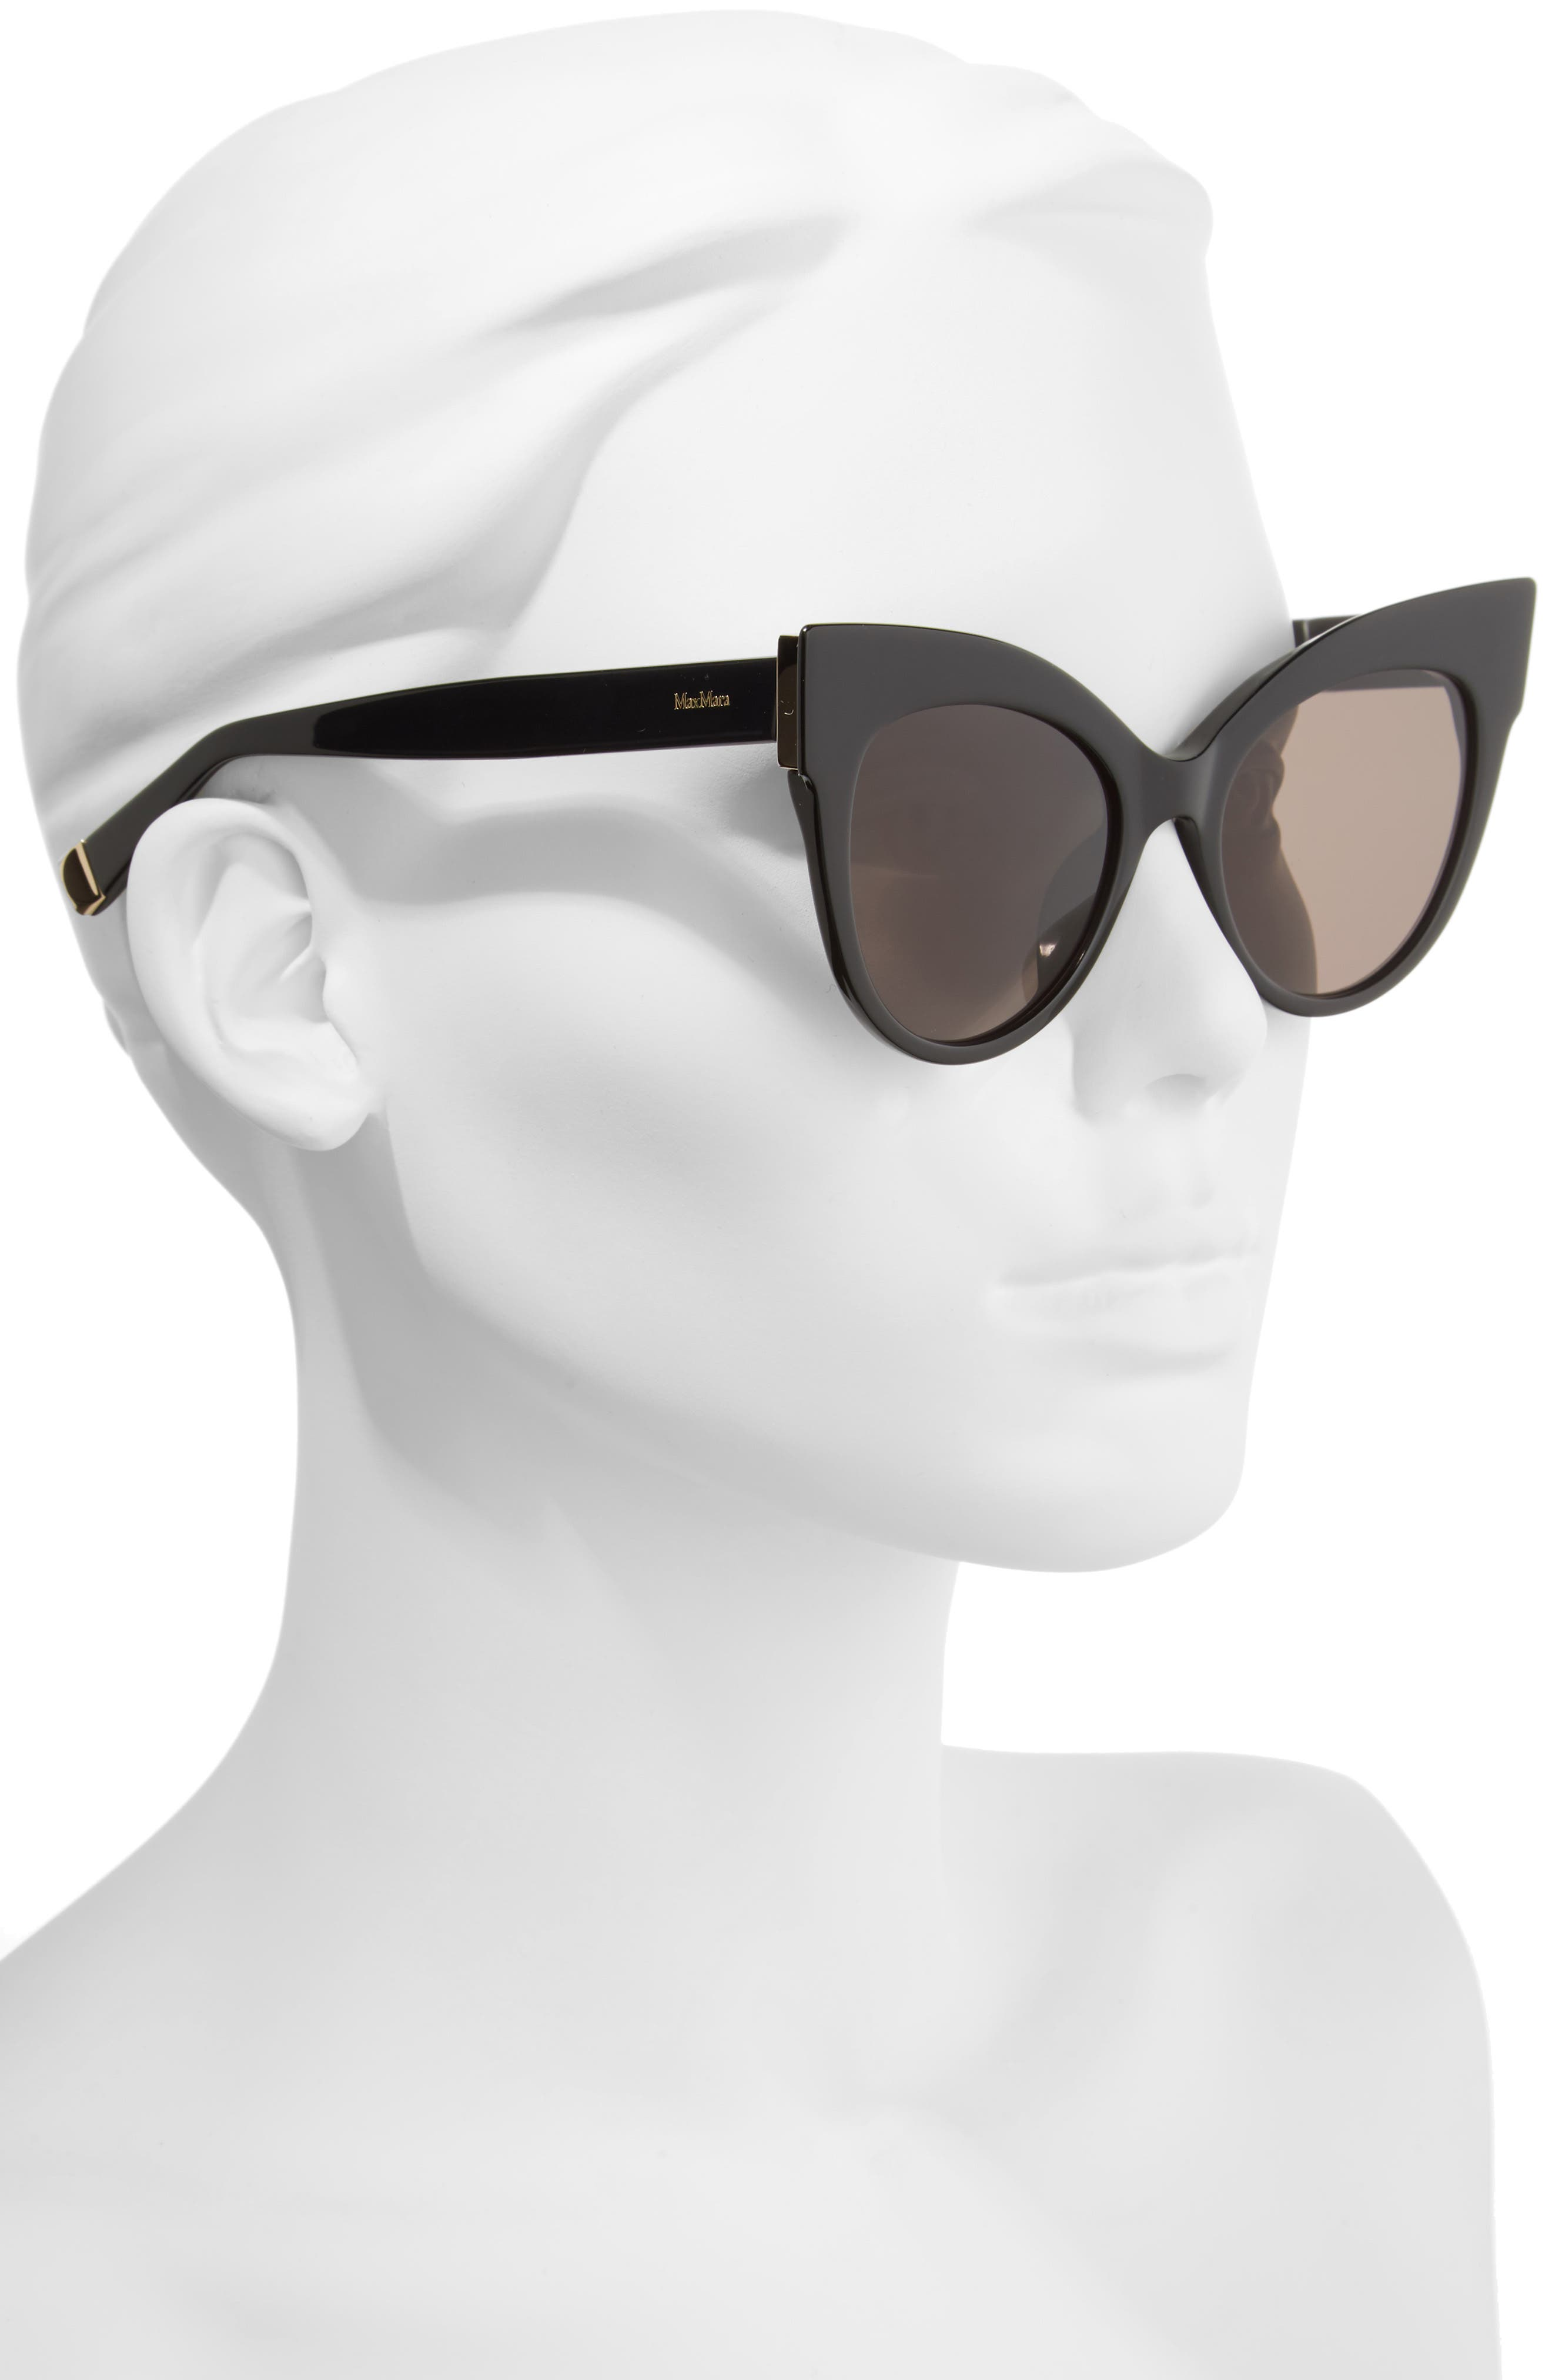 Anita 52mm Cat Eye Sunglasses,                             Alternate thumbnail 2, color,                             001